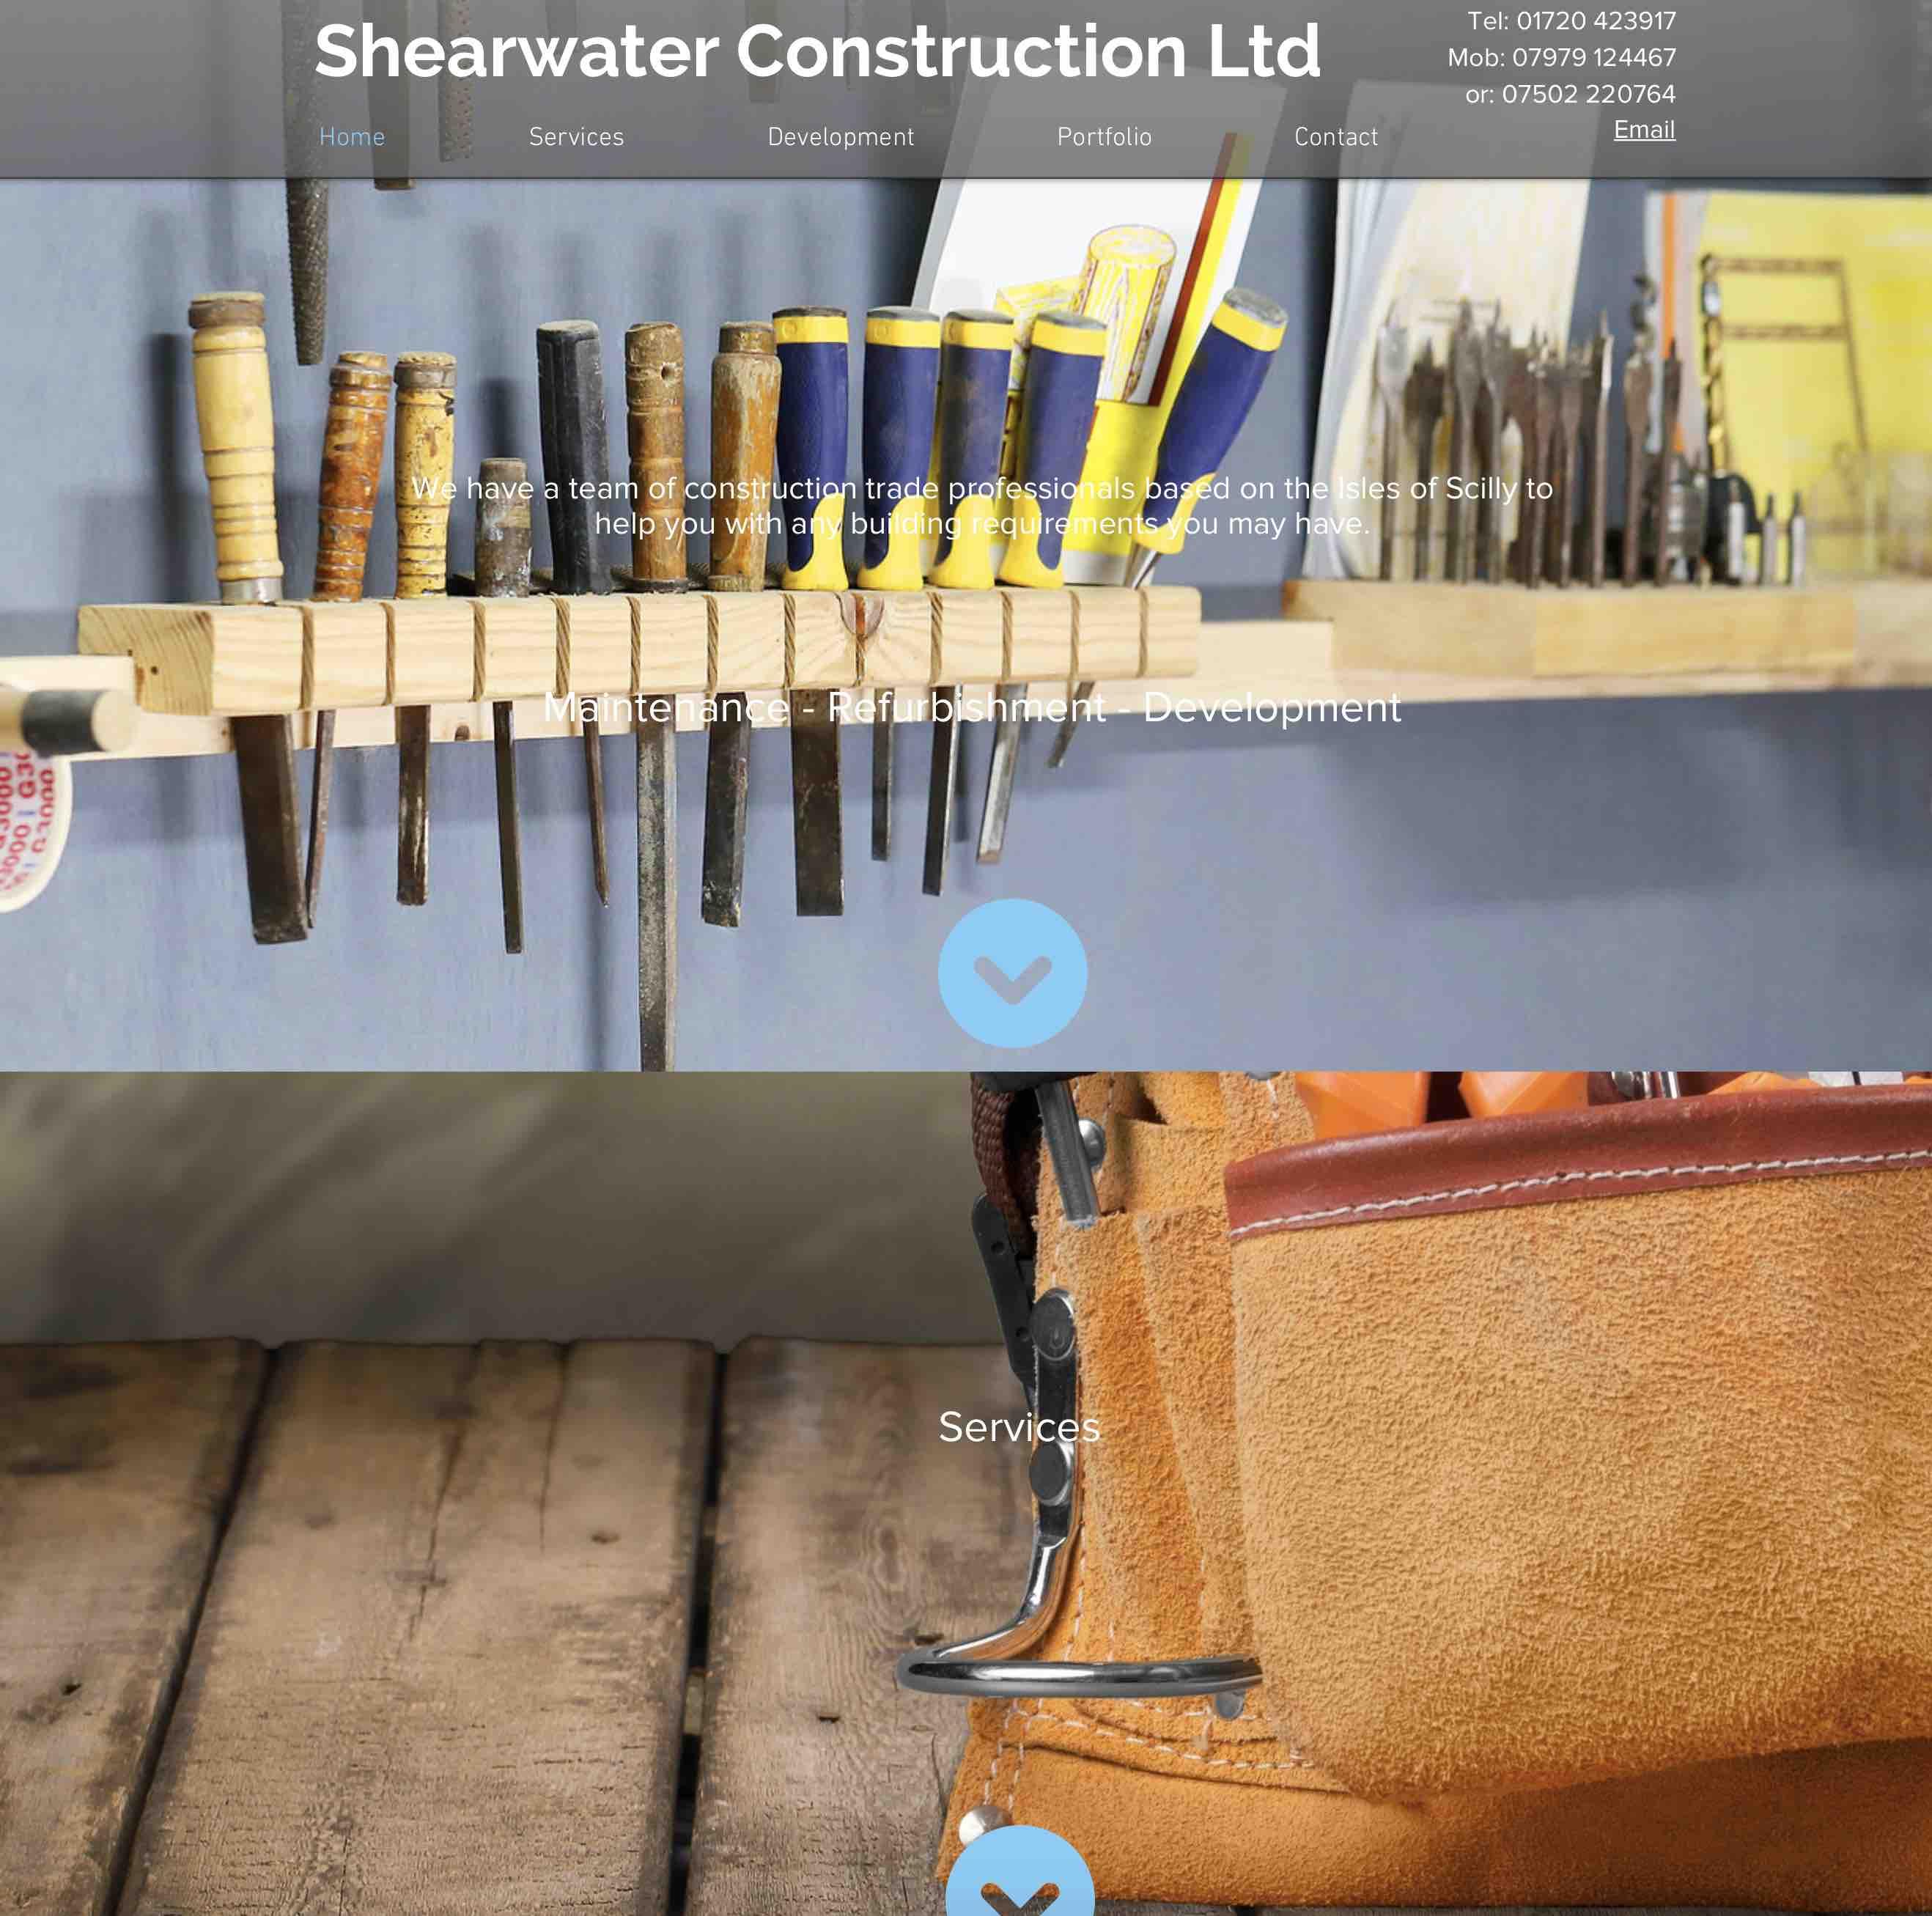 Shearwater Construction Ltd